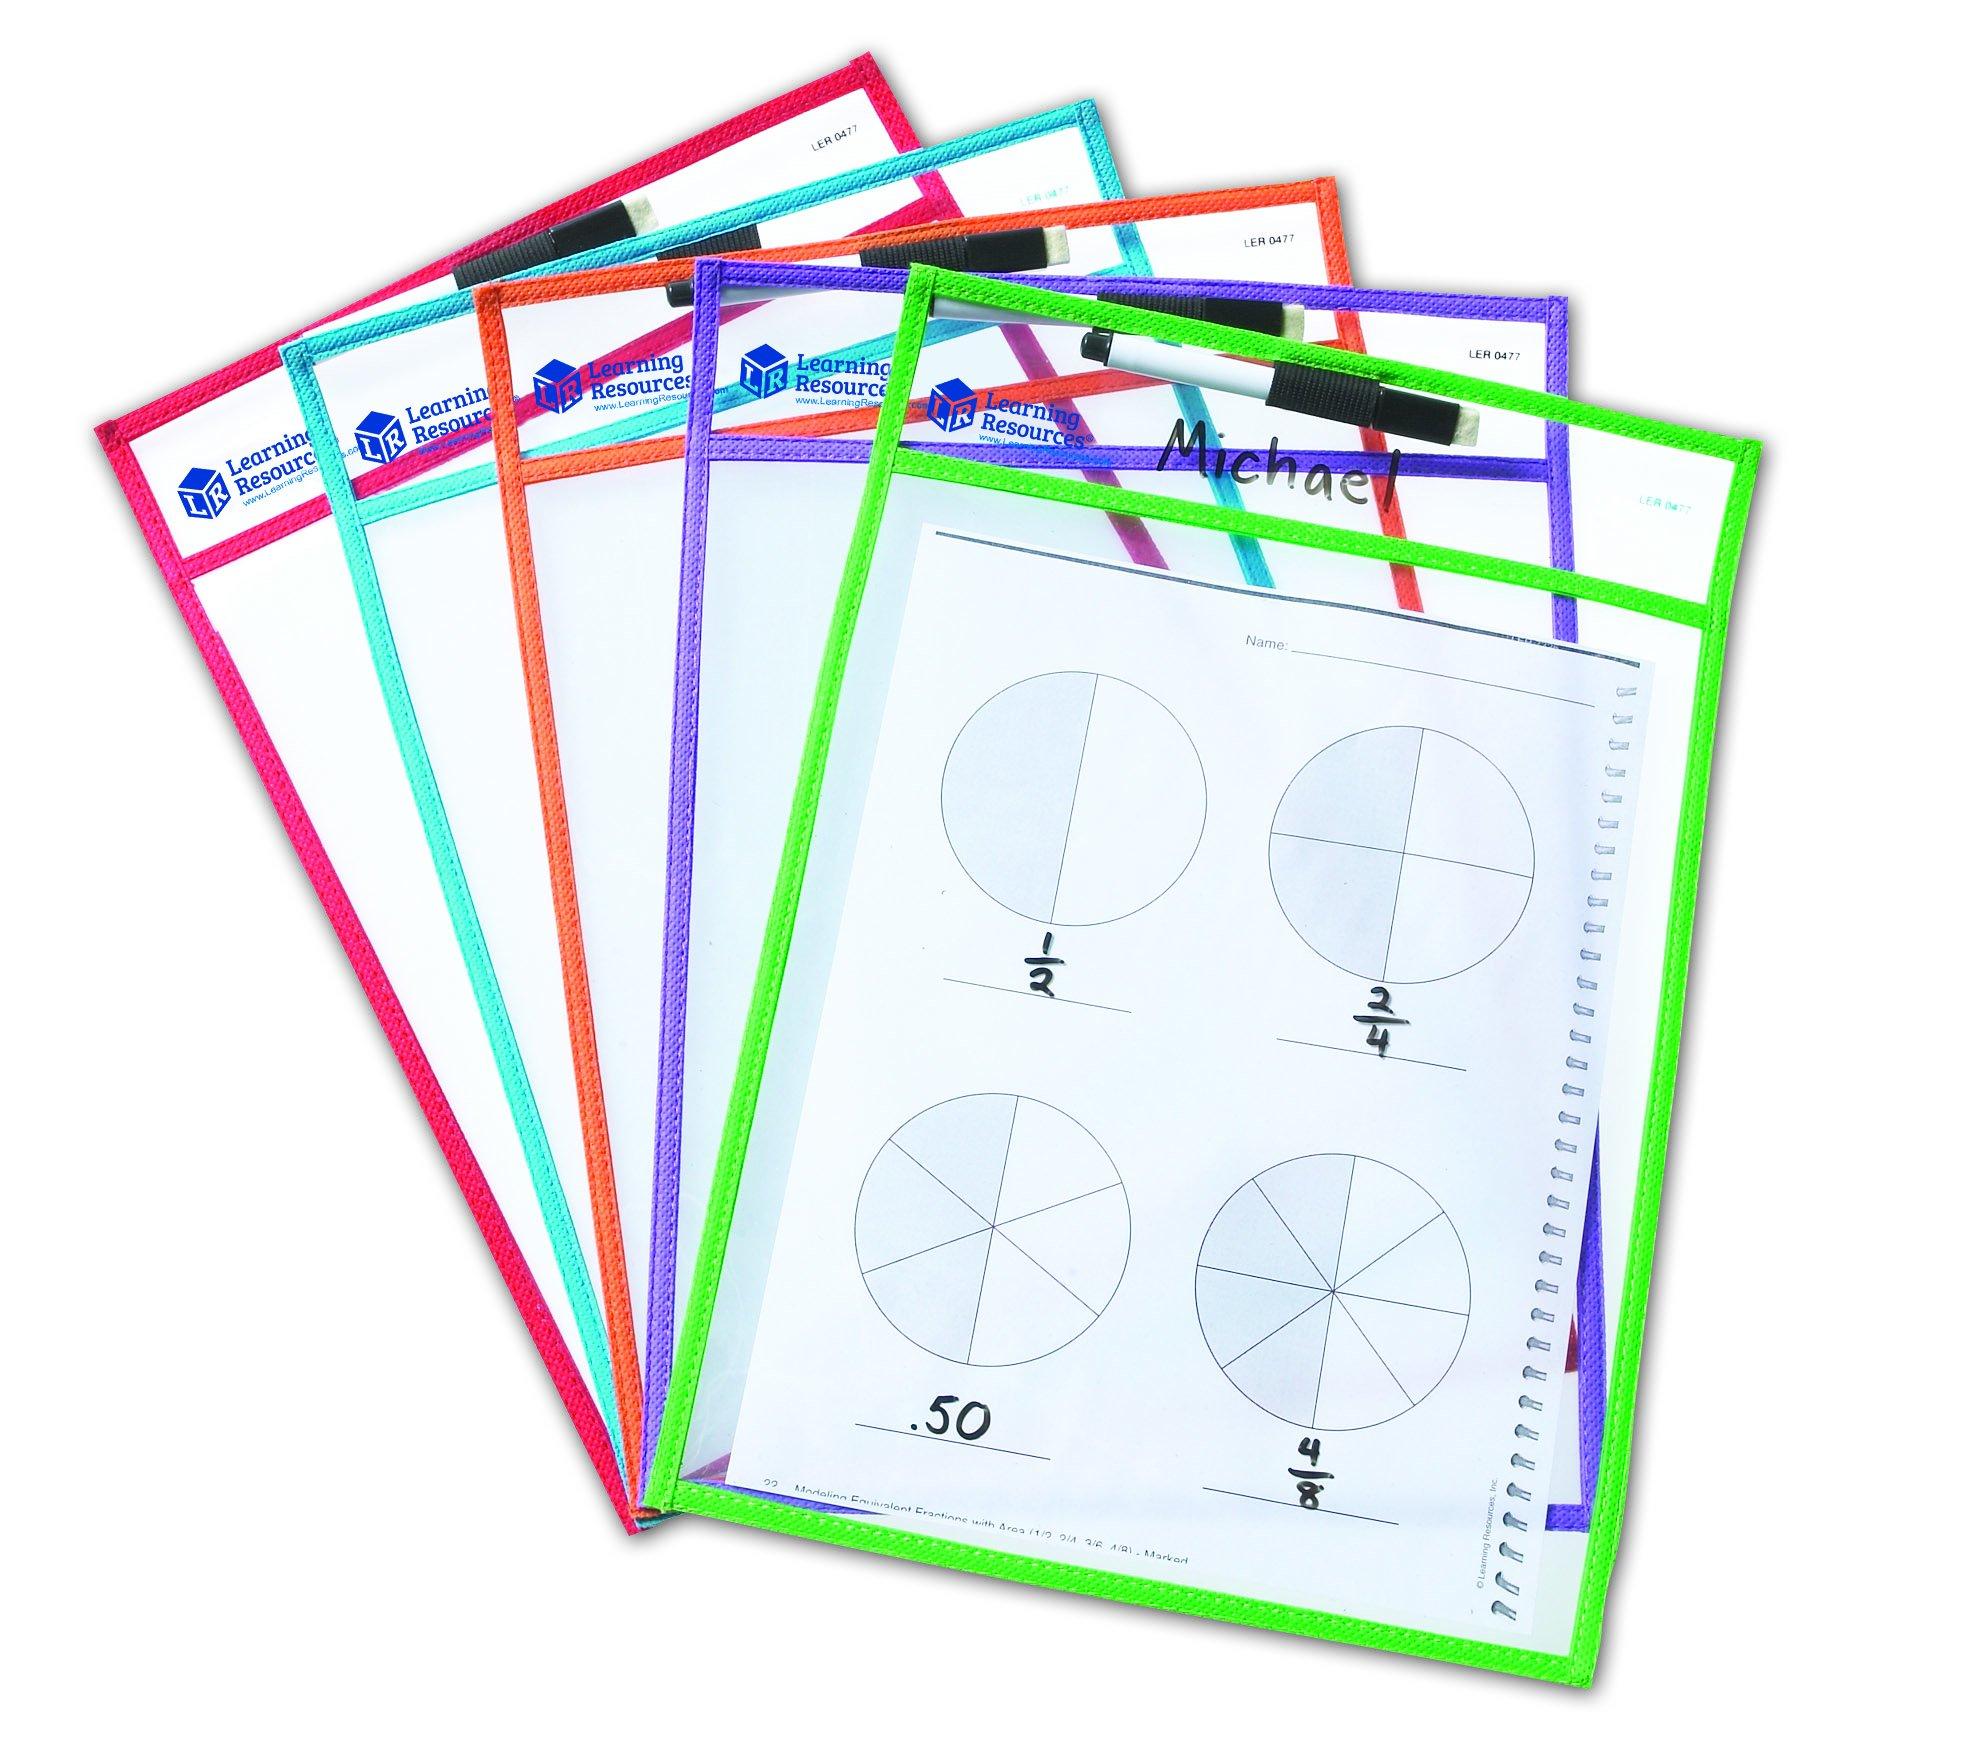 Learning Resources - Escribir y limpiar bolsillos product image